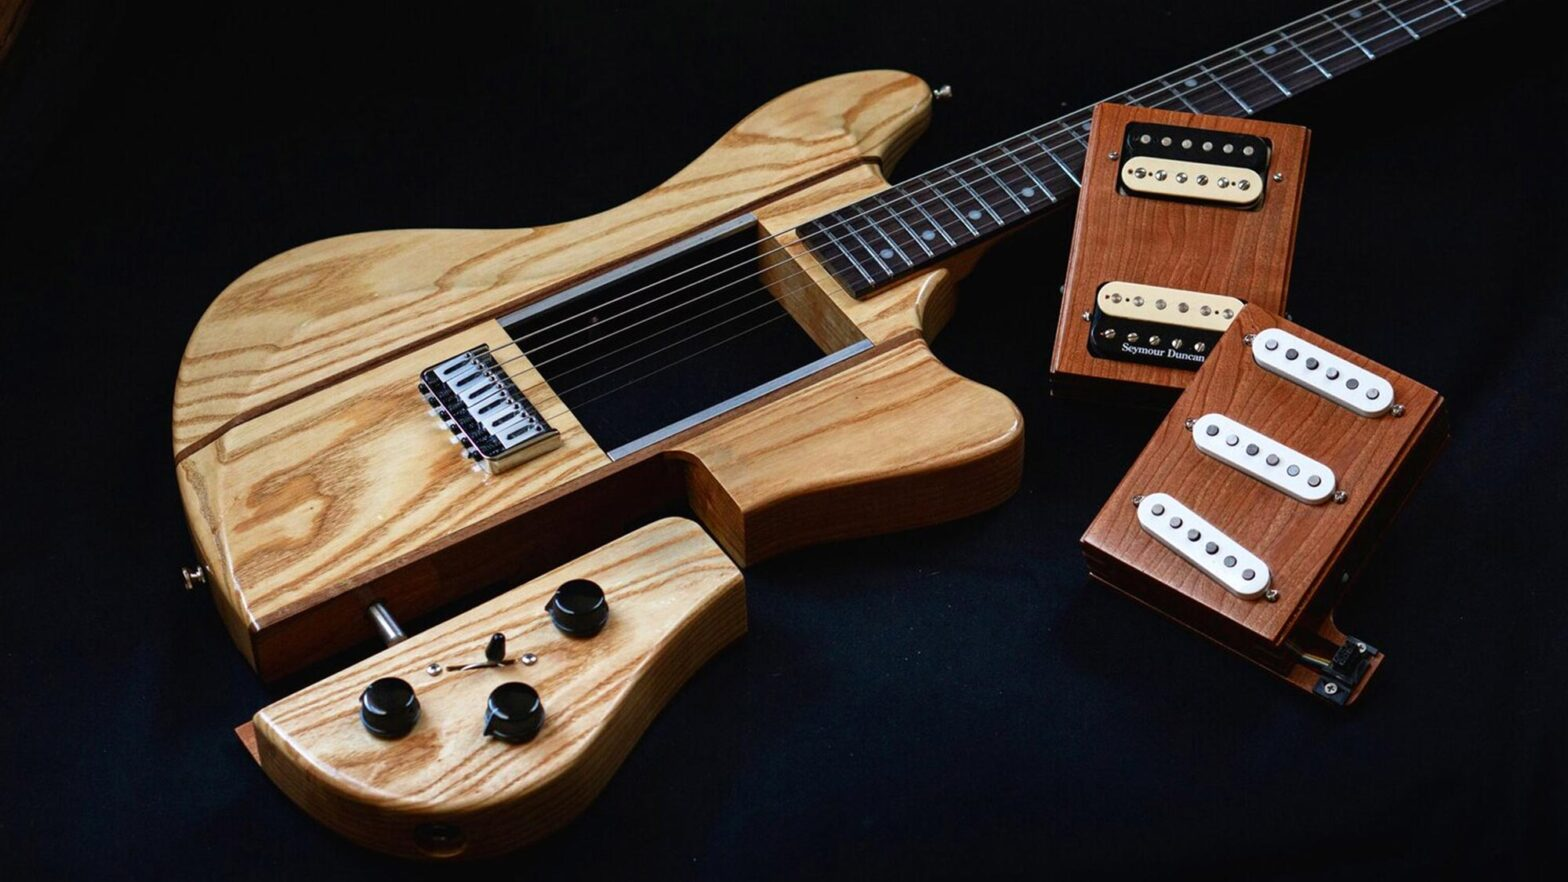 Reddick Voyager Modular Electric Guitar